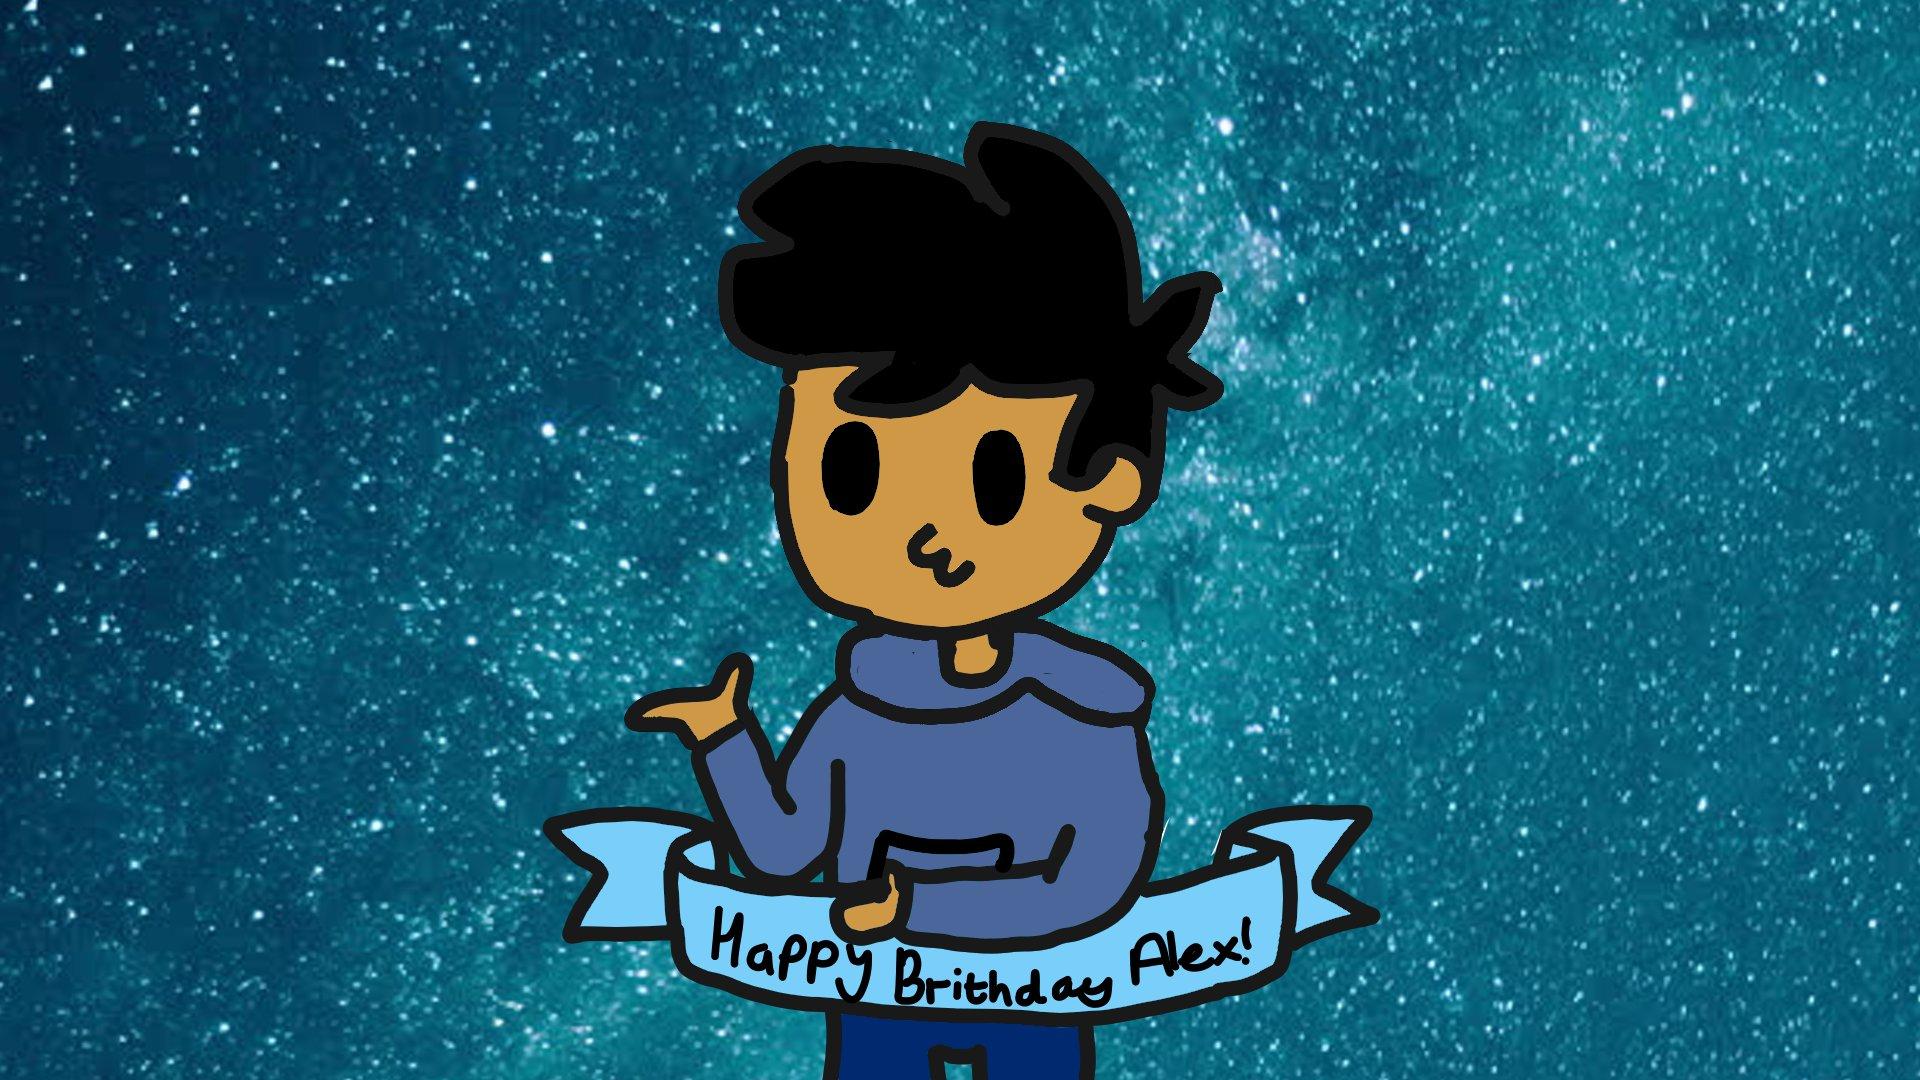 Birthday fan art (old) for Alex Animations